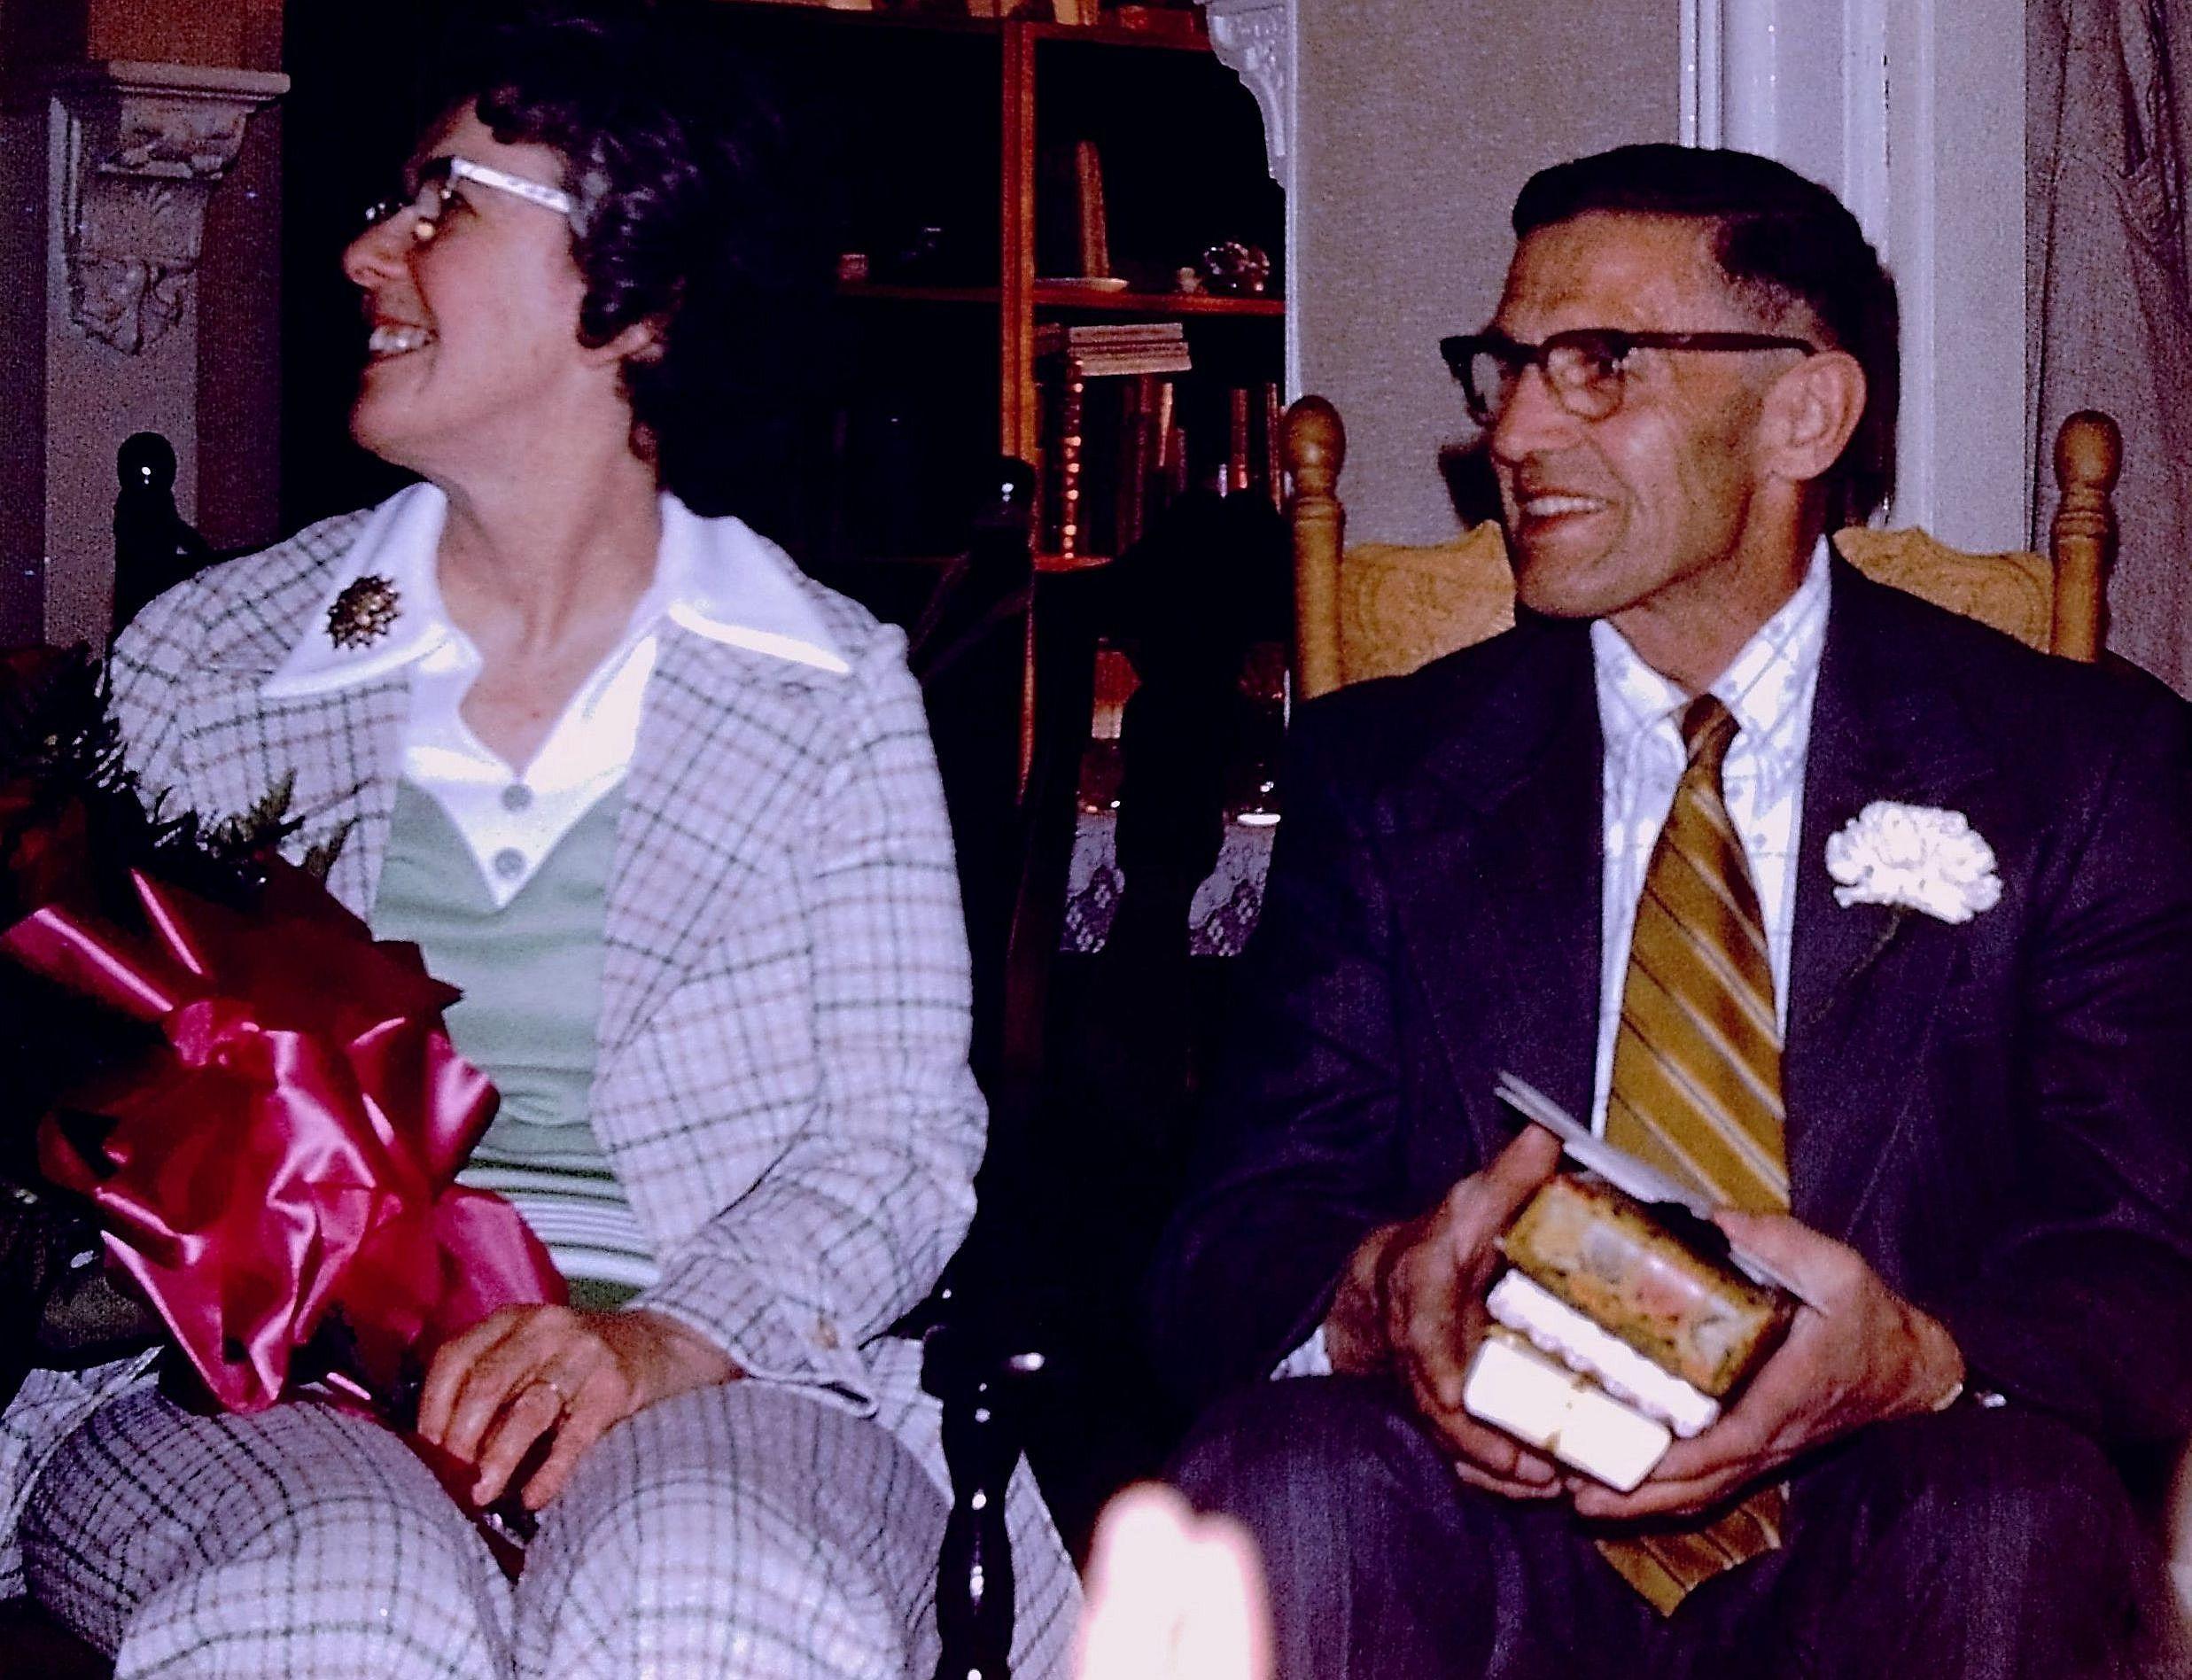 John VanVolkenburg retires. (with Doris) Party at Welch's, 1975